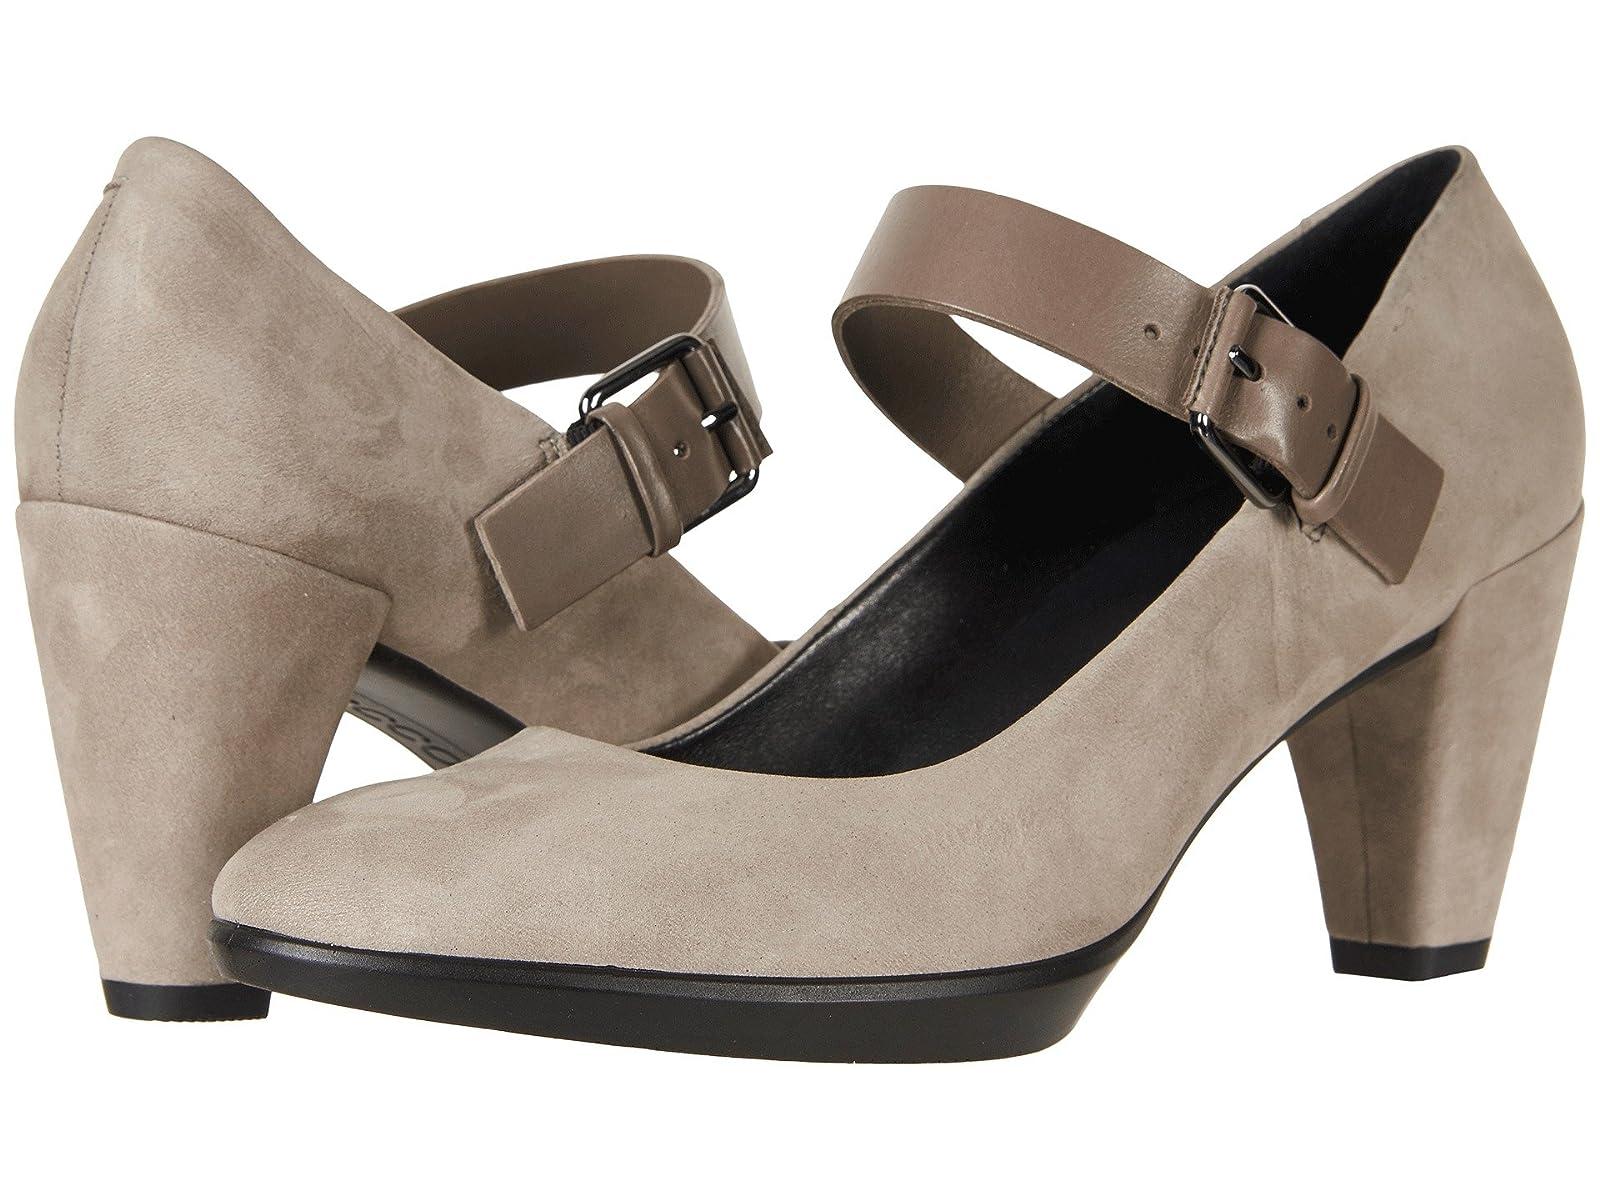 ECCO Shape 55 Plateau Mary Jane PumpCheap and distinctive eye-catching shoes